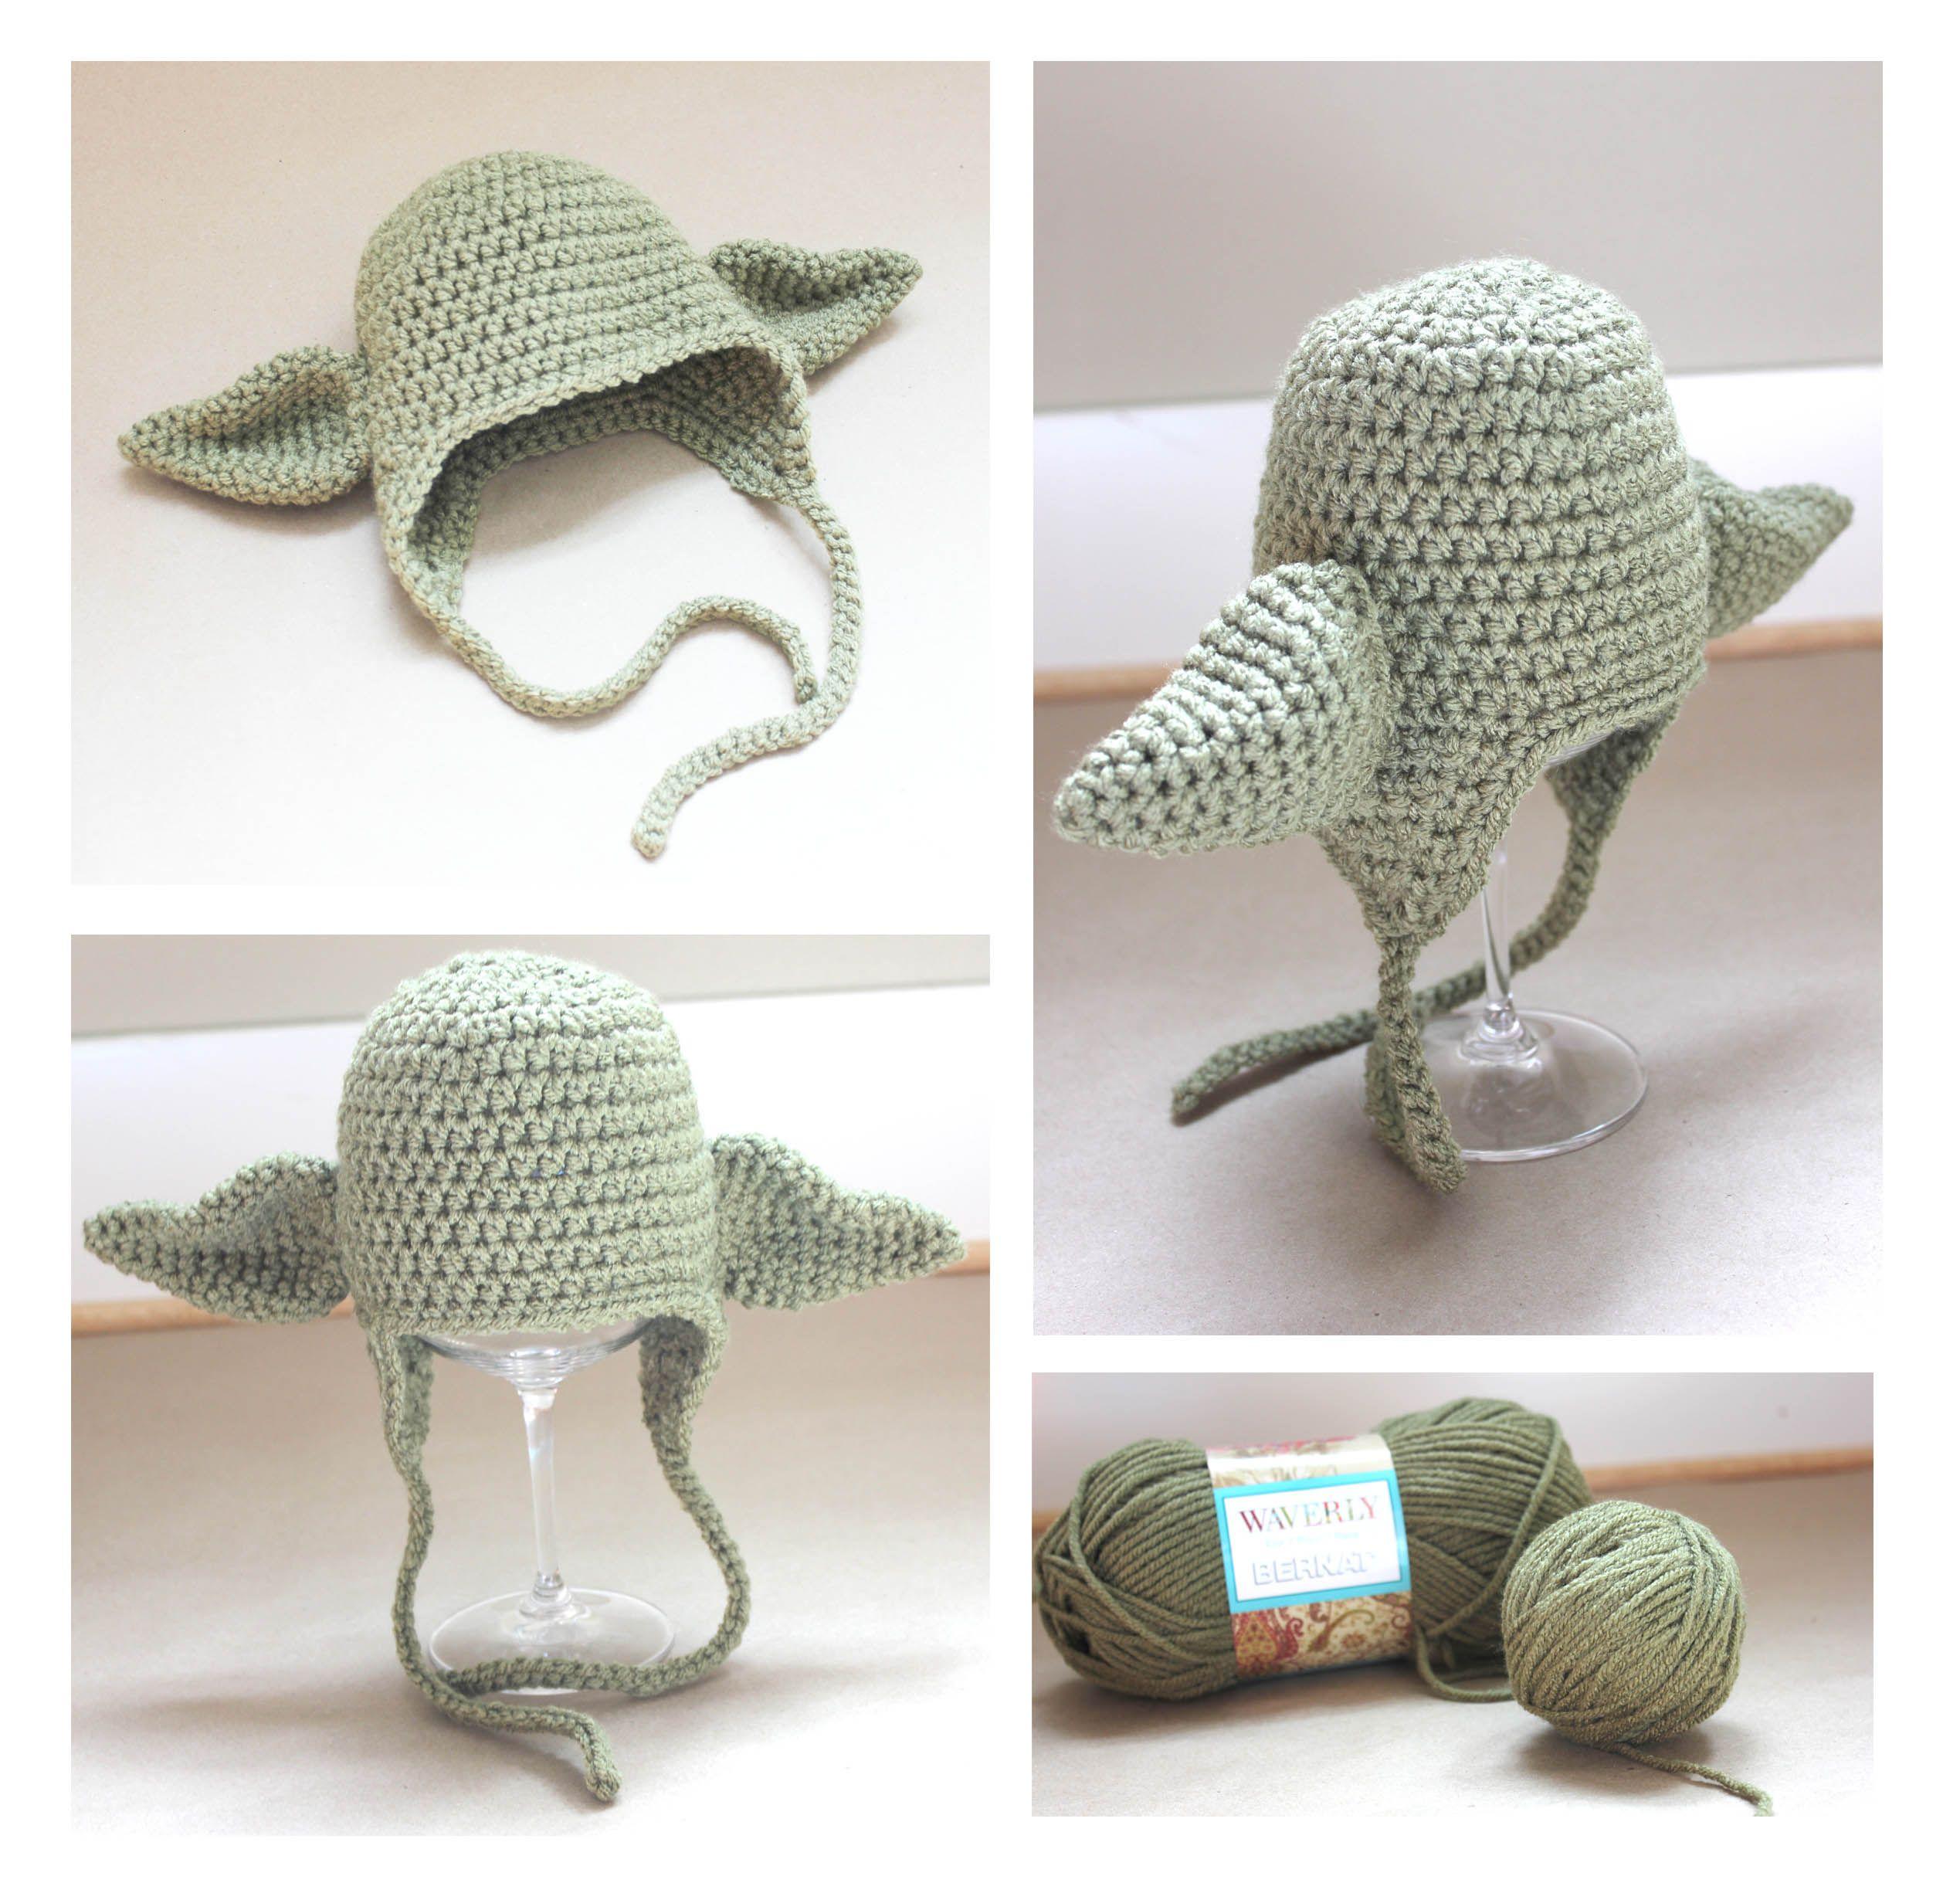 Crochet Yoda Hat   Stuff I should try to make   Pinterest ...